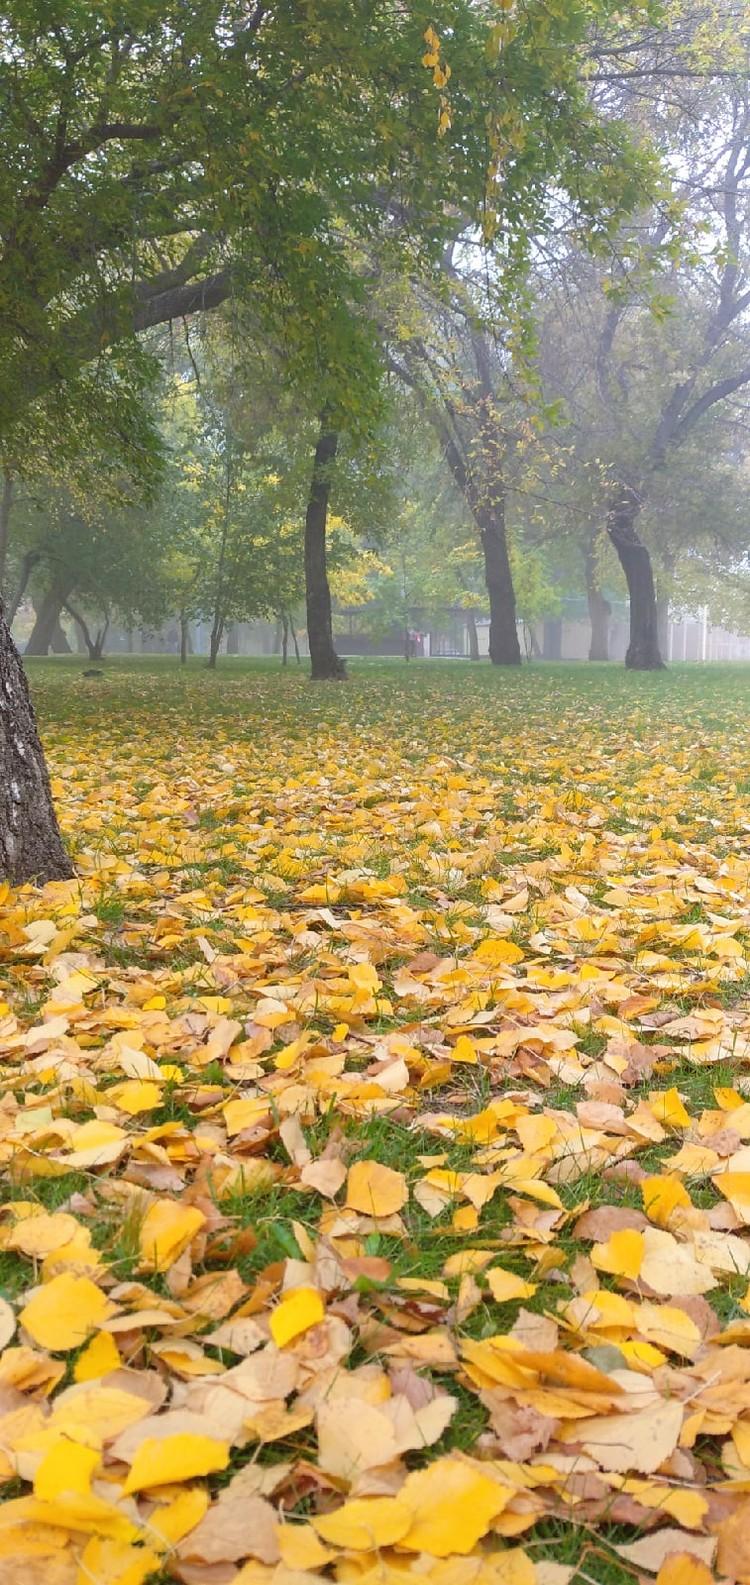 В горсаду имени Пушкина появился ковер из листьев. Фото: vk.com / «Горсад им. А.С. Пушкина»